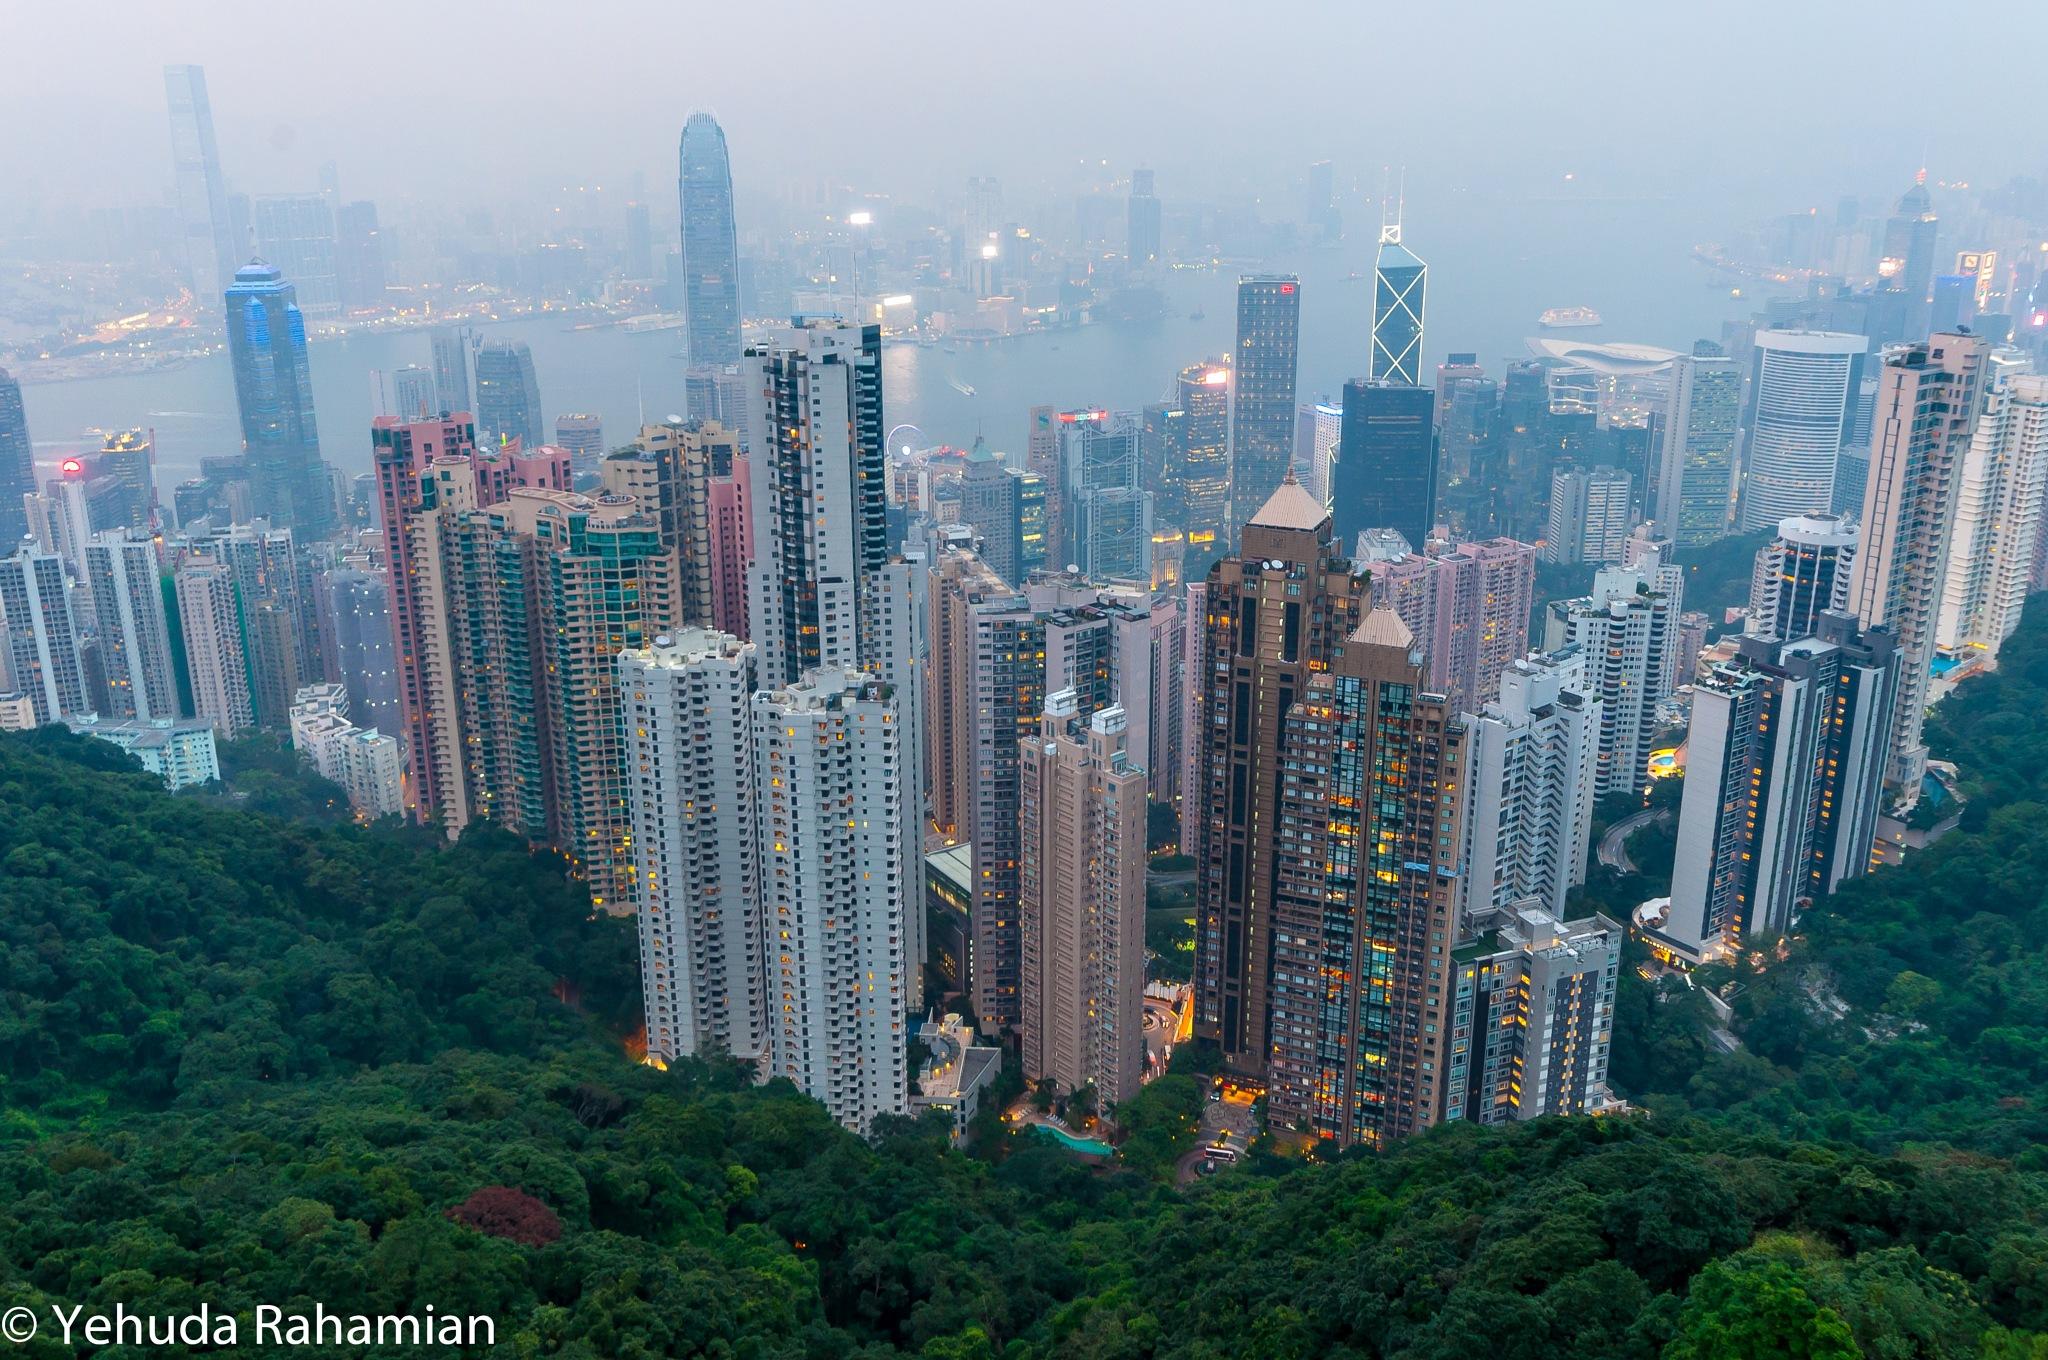 victoria peak - Hong Kong by udiram